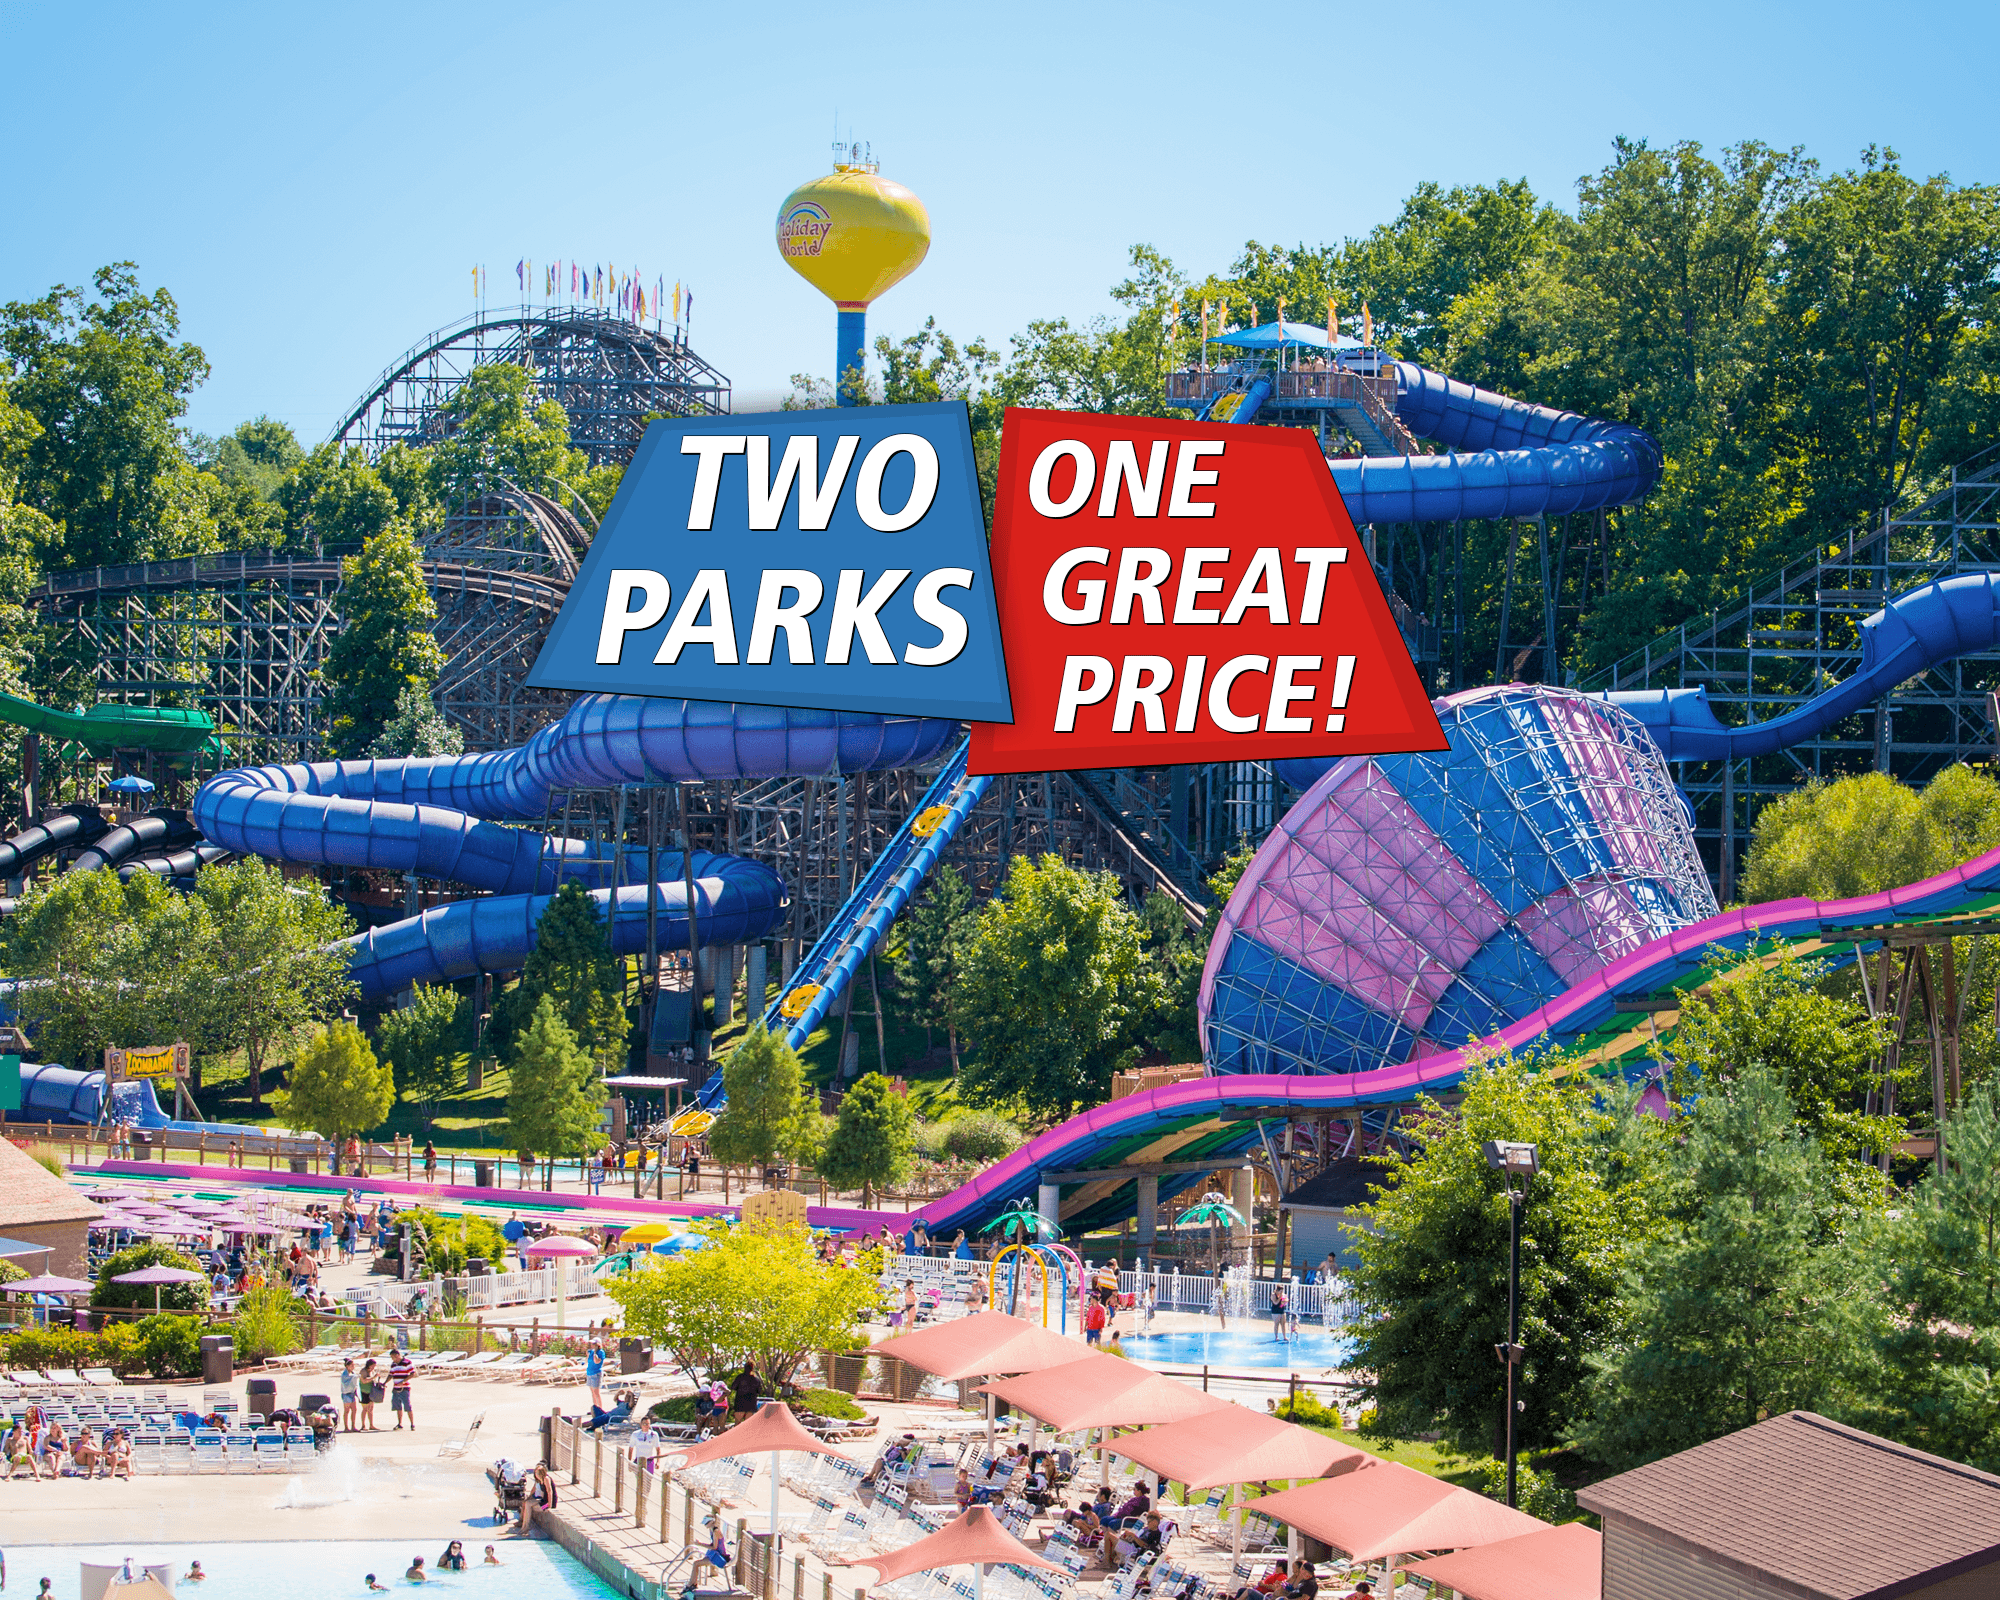 Two Parks, One Price! Holiday World & Splashin' Safari